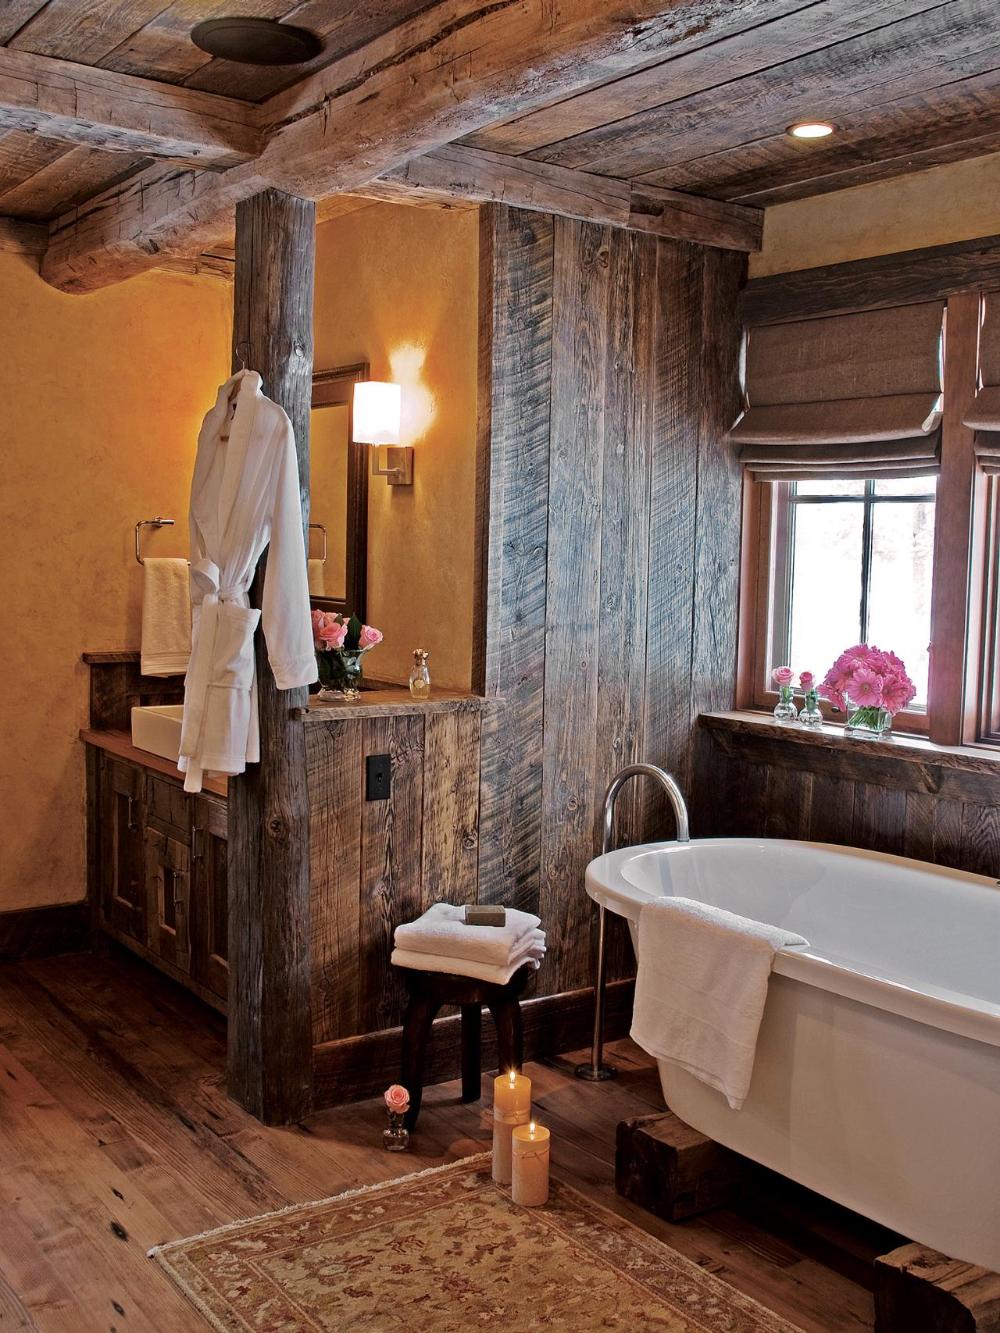 Western Bathroom Designs In 2020 Western Bathroom Decor Western Bathrooms Rustic Bathroom Designs